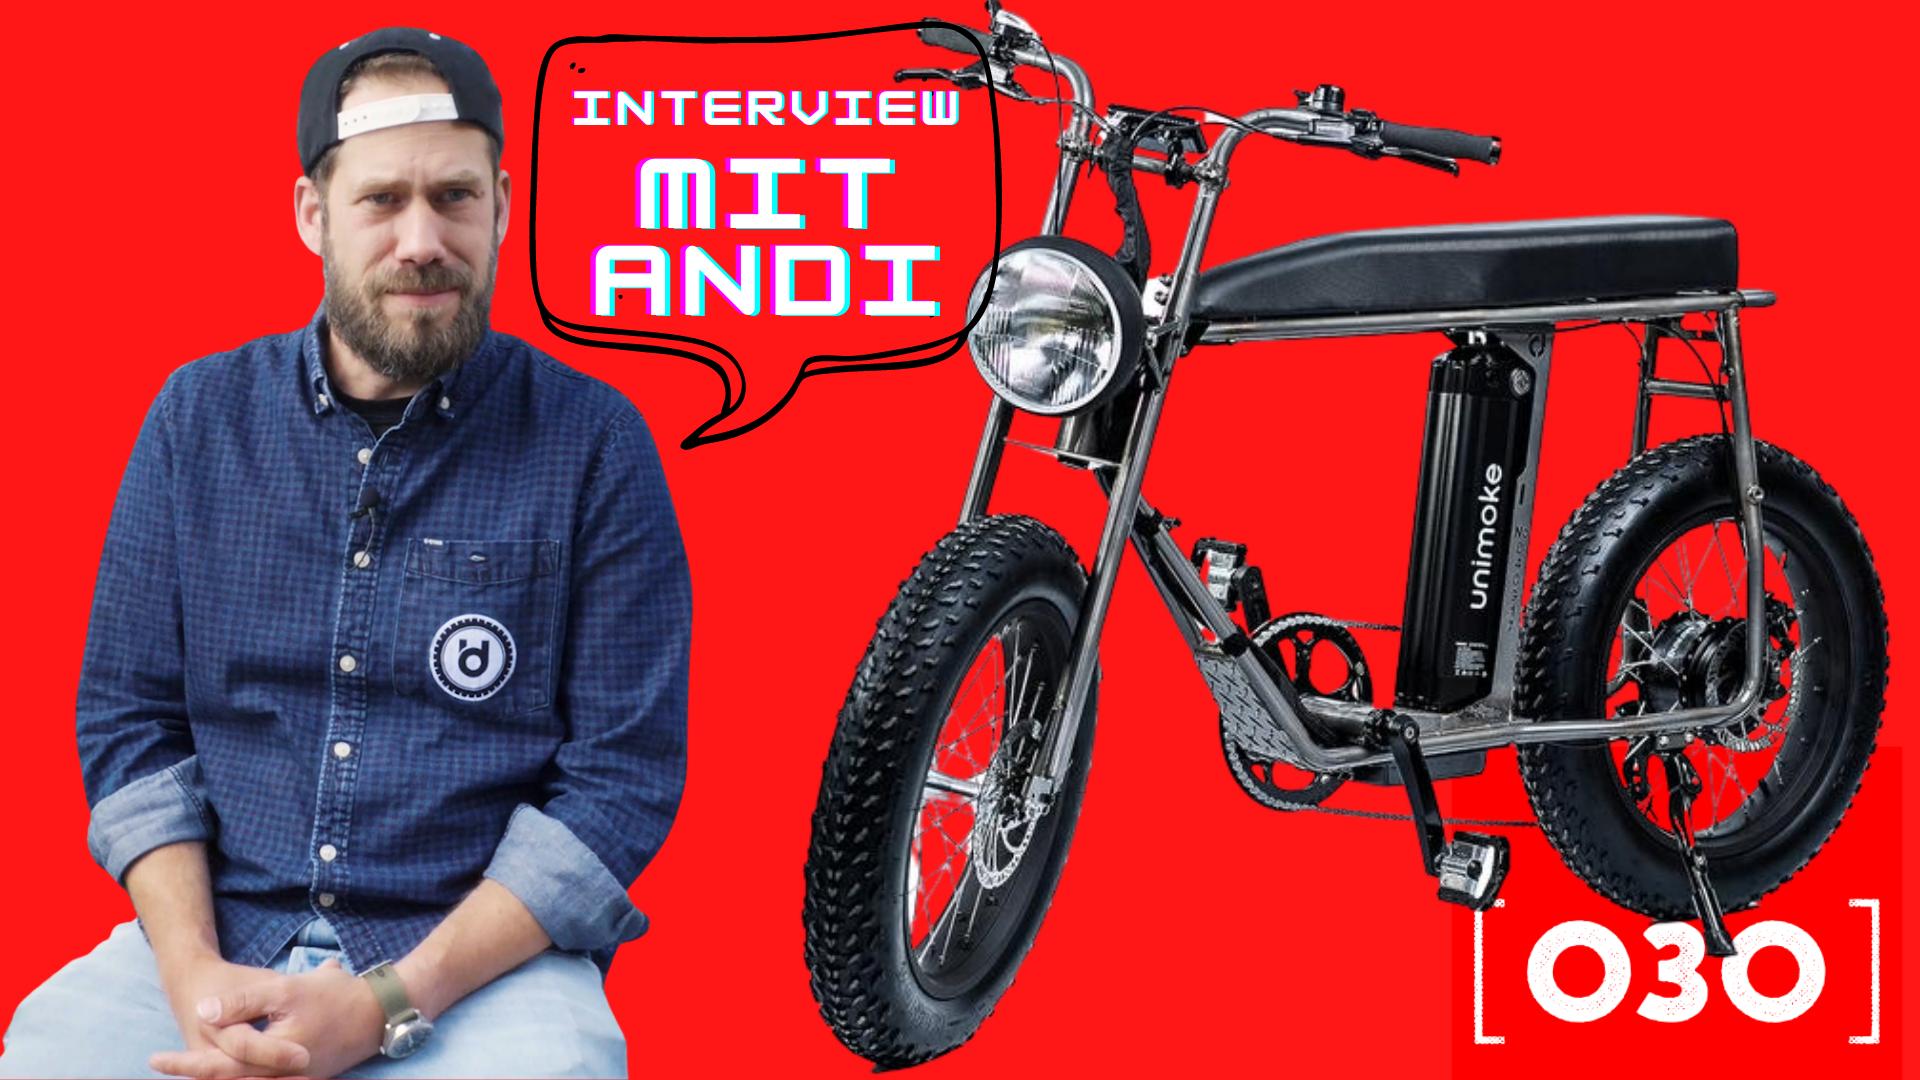 Urban Drivestyle, UDK, Bike, Berlin, Interview